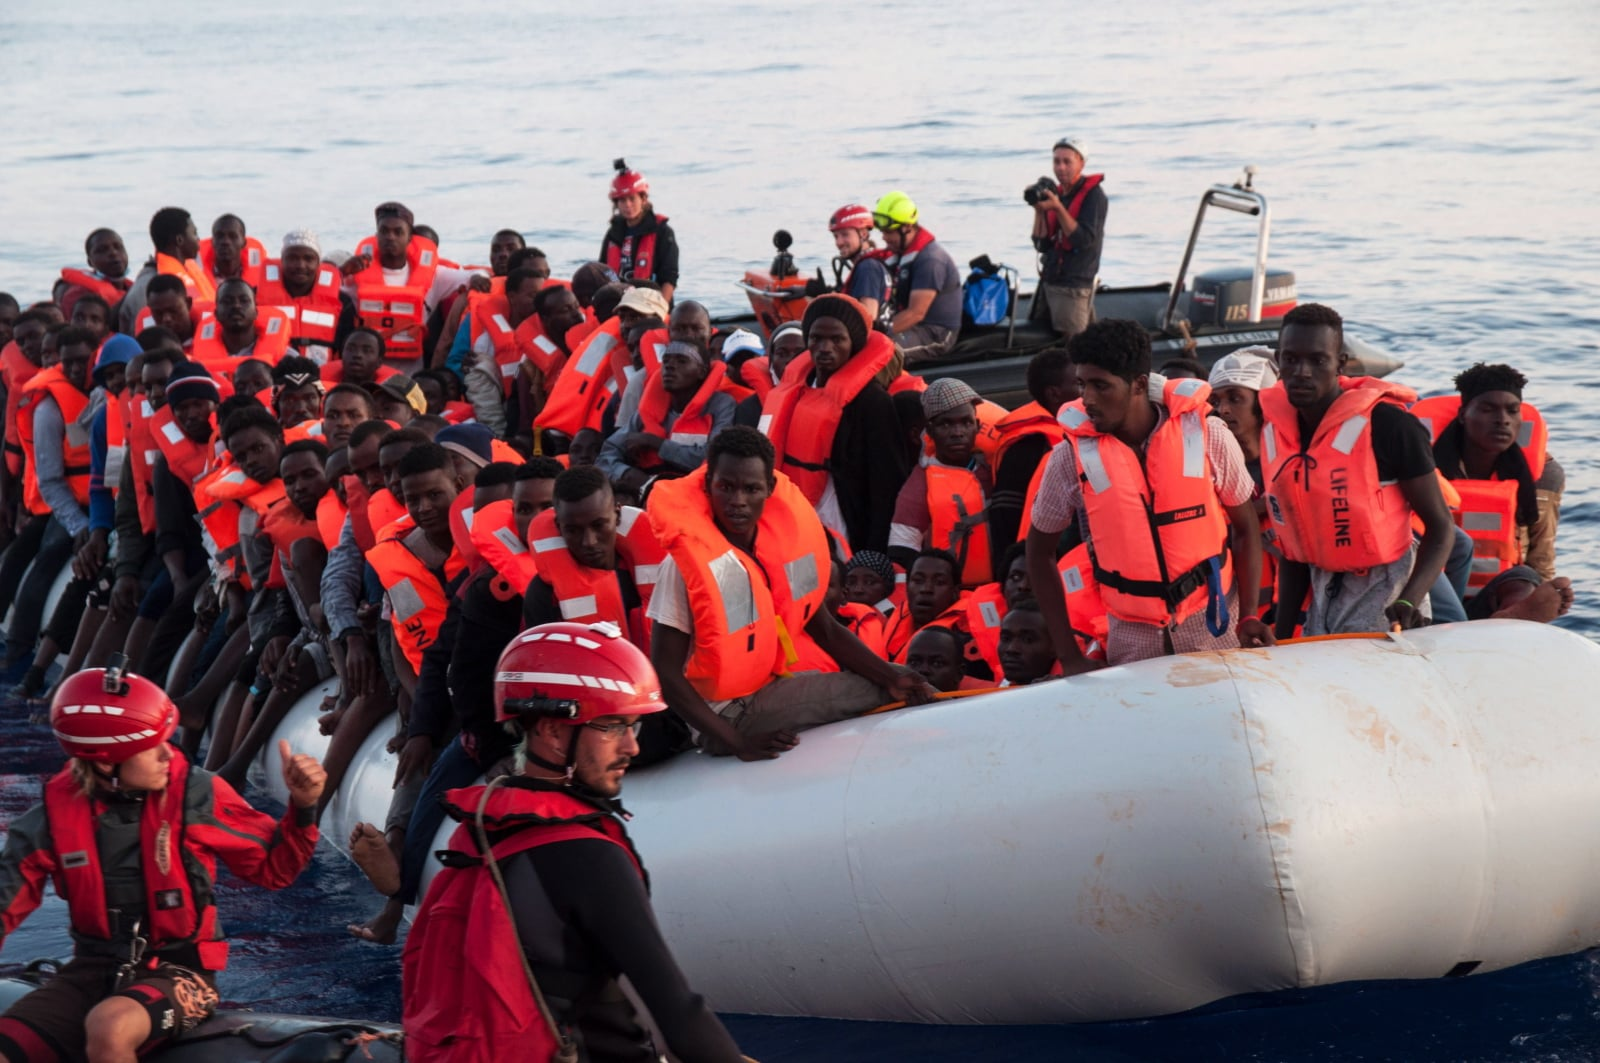 Ratunek dla migrantów fot. EPA/HERMINE POSCHMANN